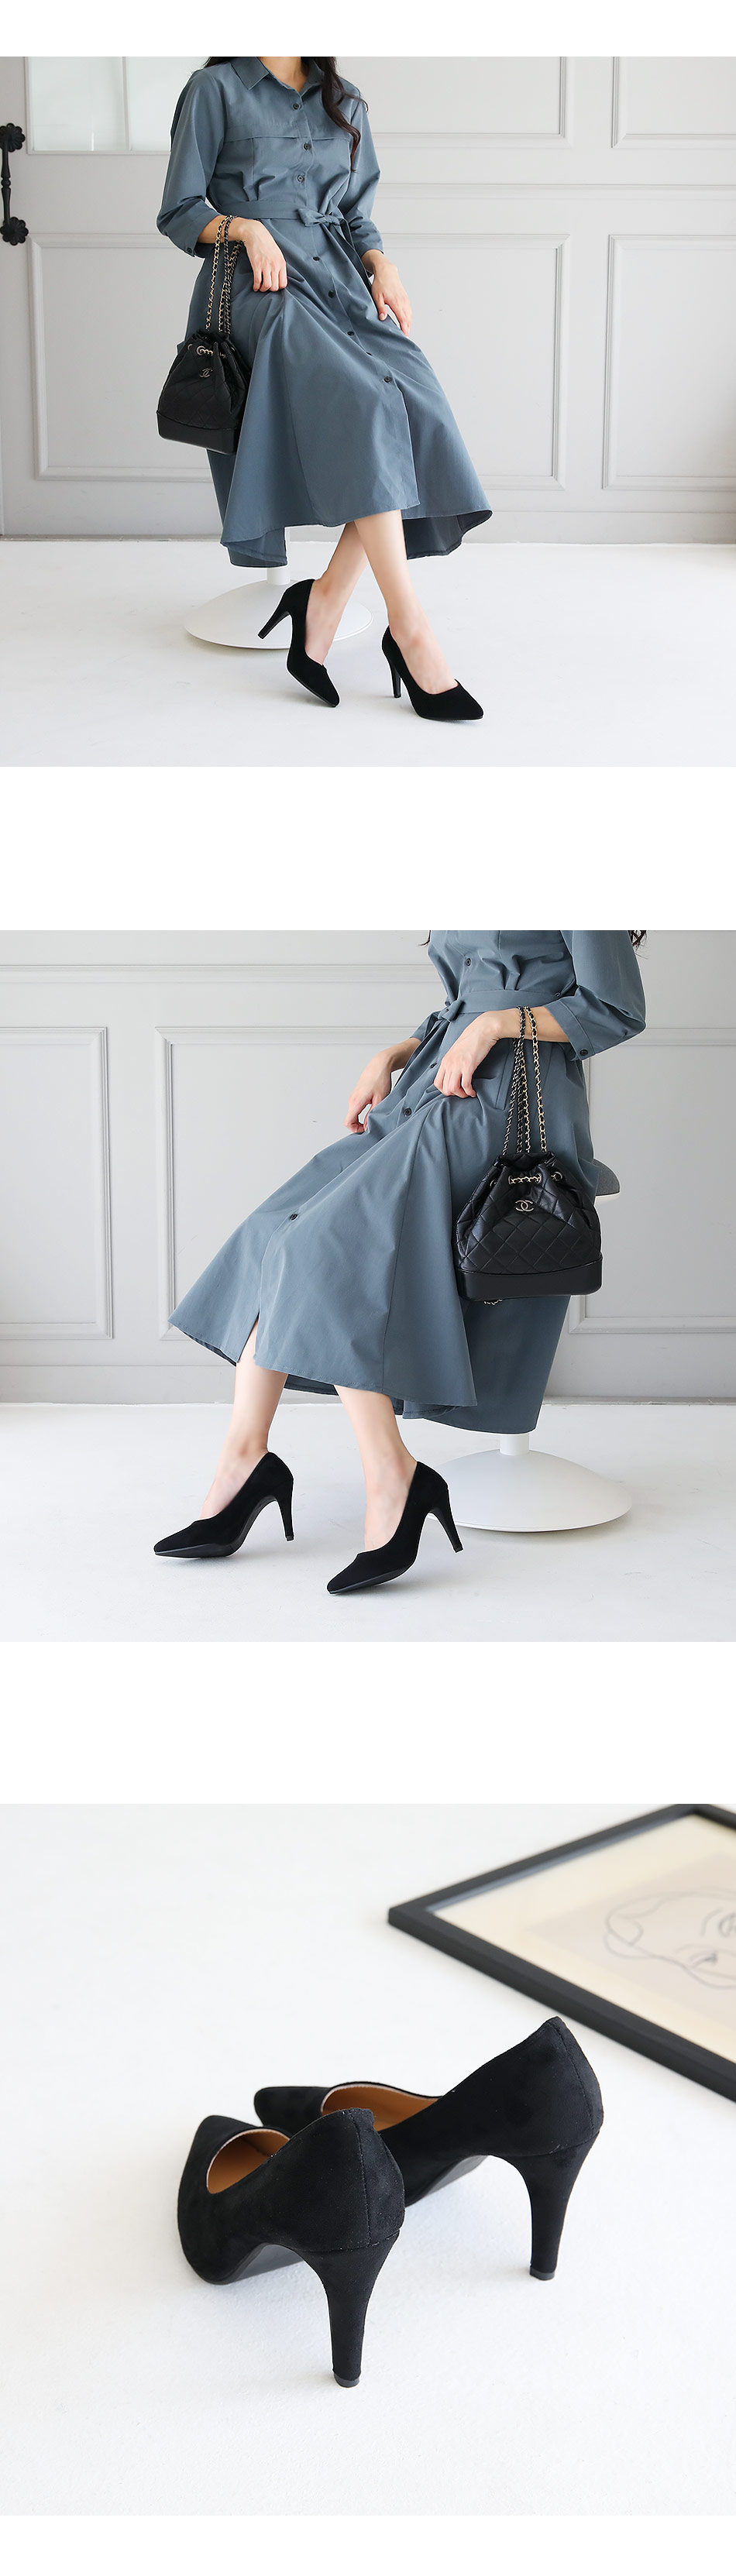 Slint Stiletto Heel 9cm